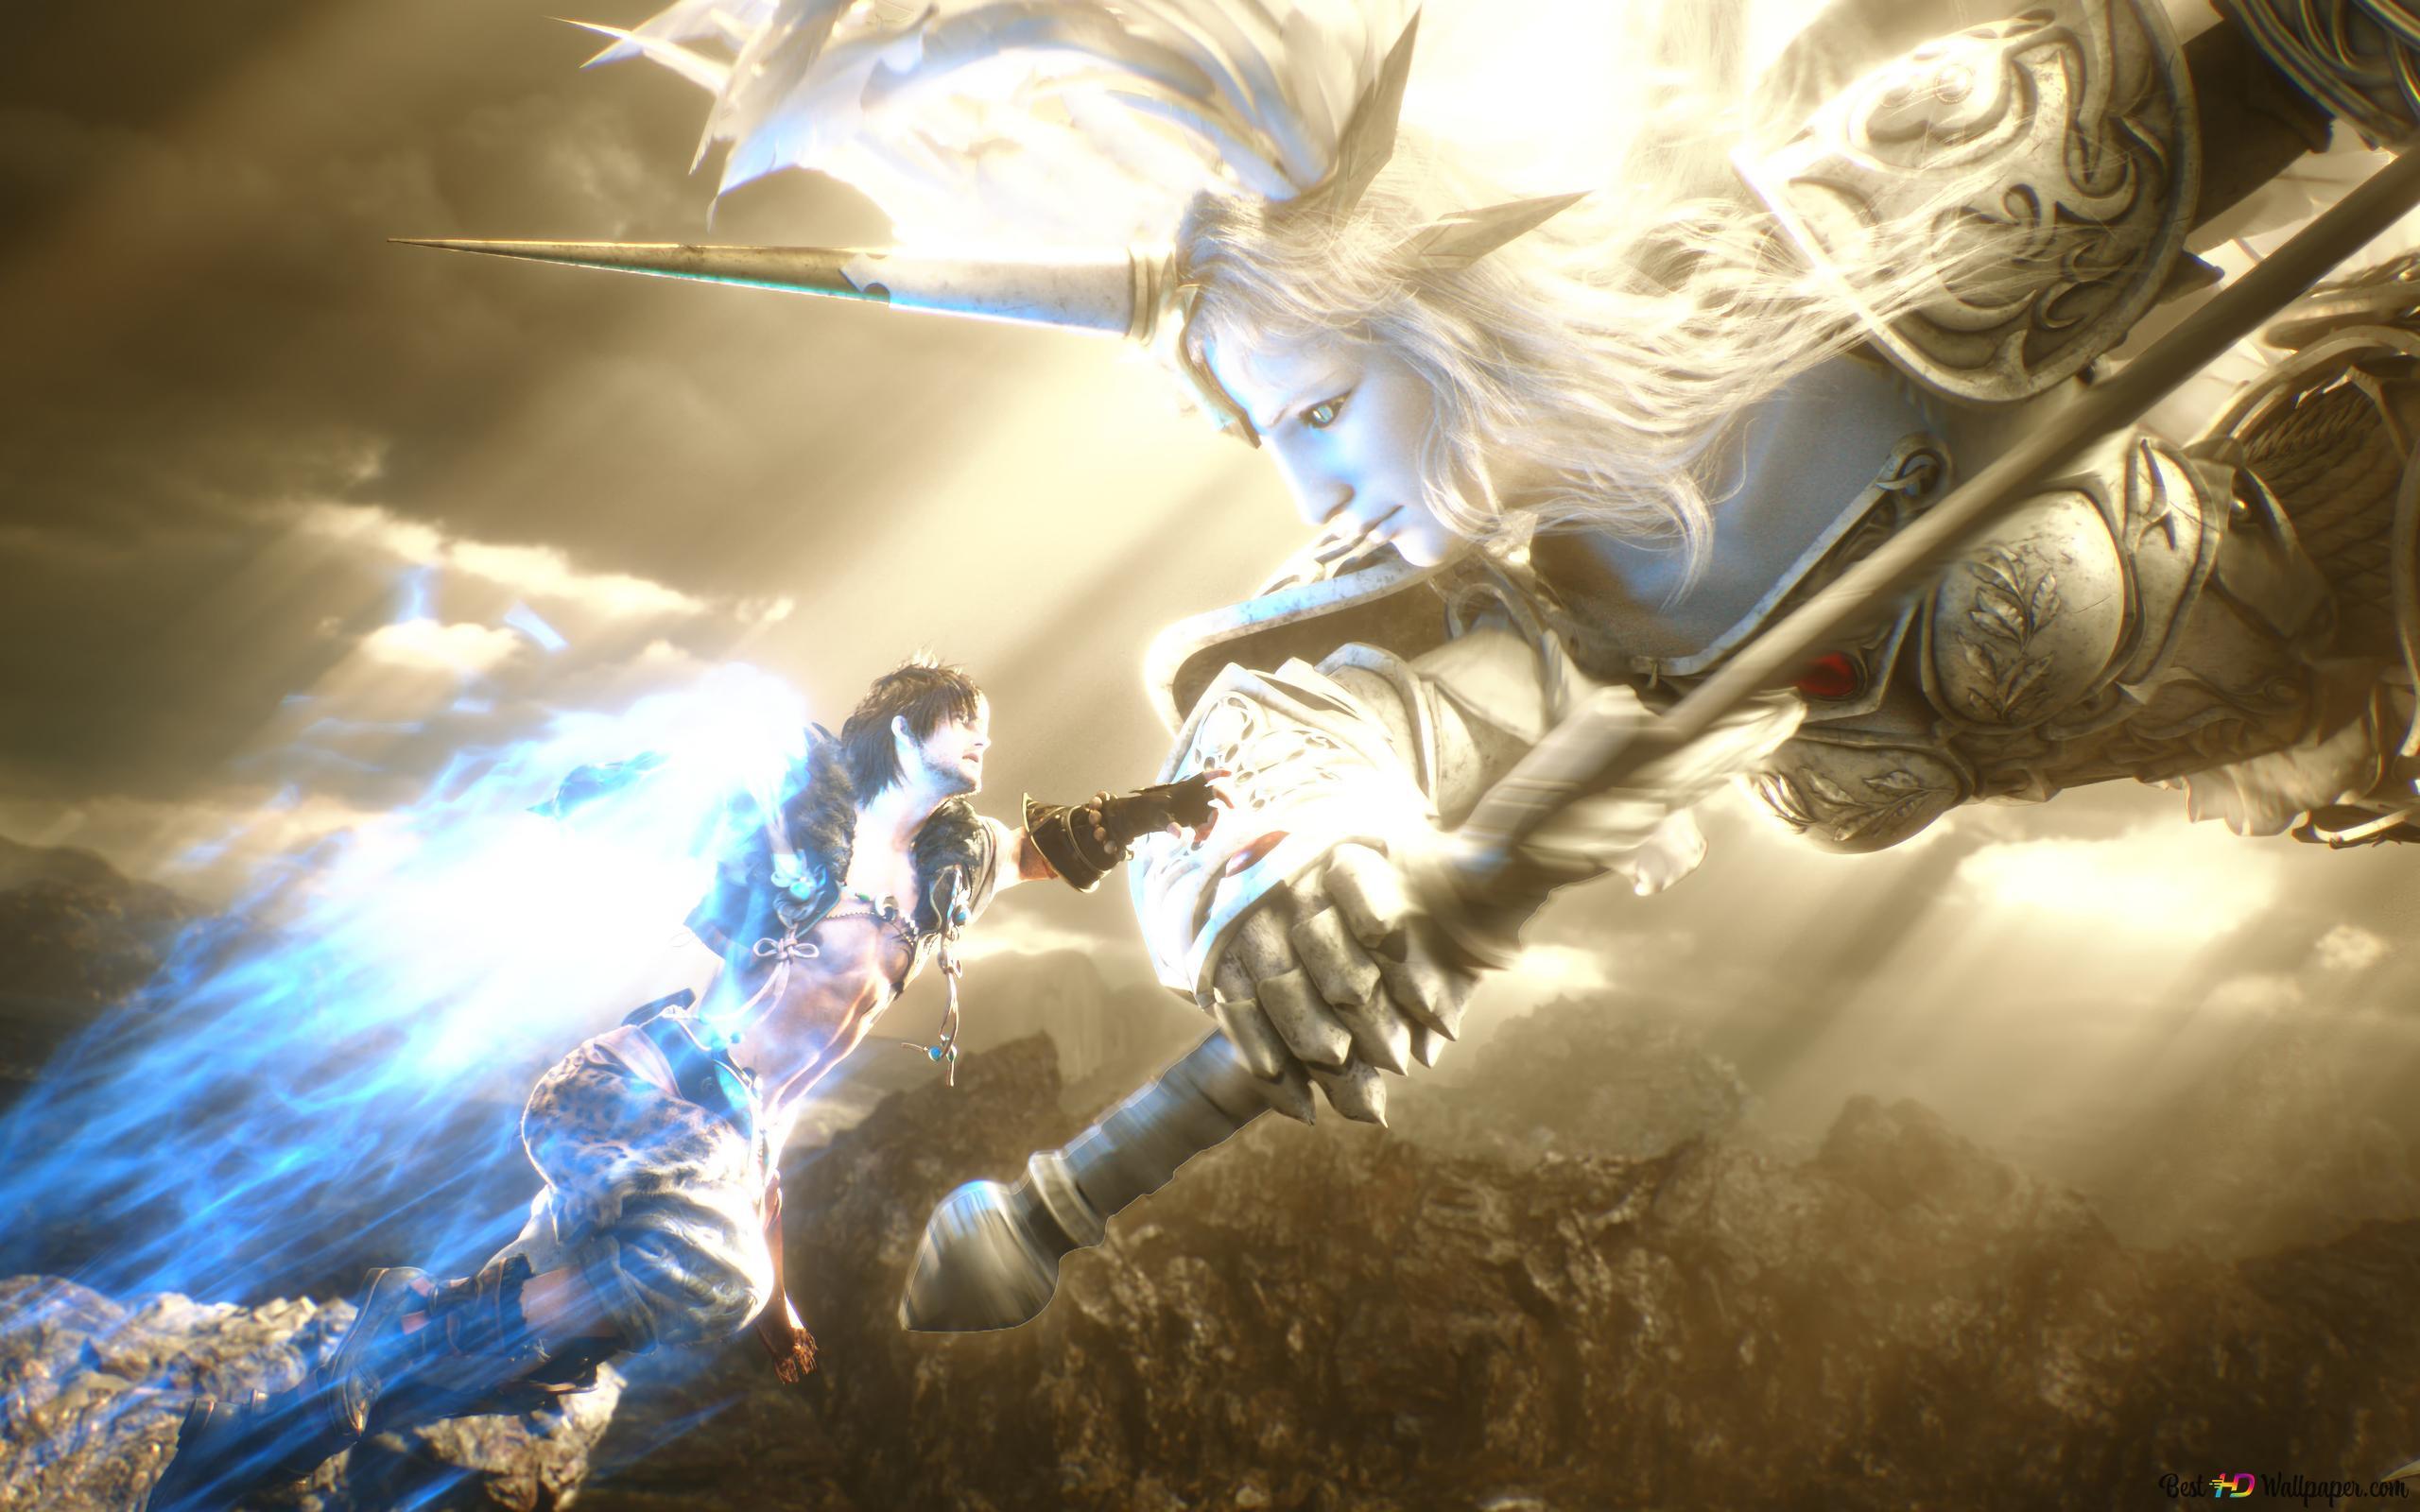 Final Fantasy XIV : Shadowbringers 2019 HD wallpaper download